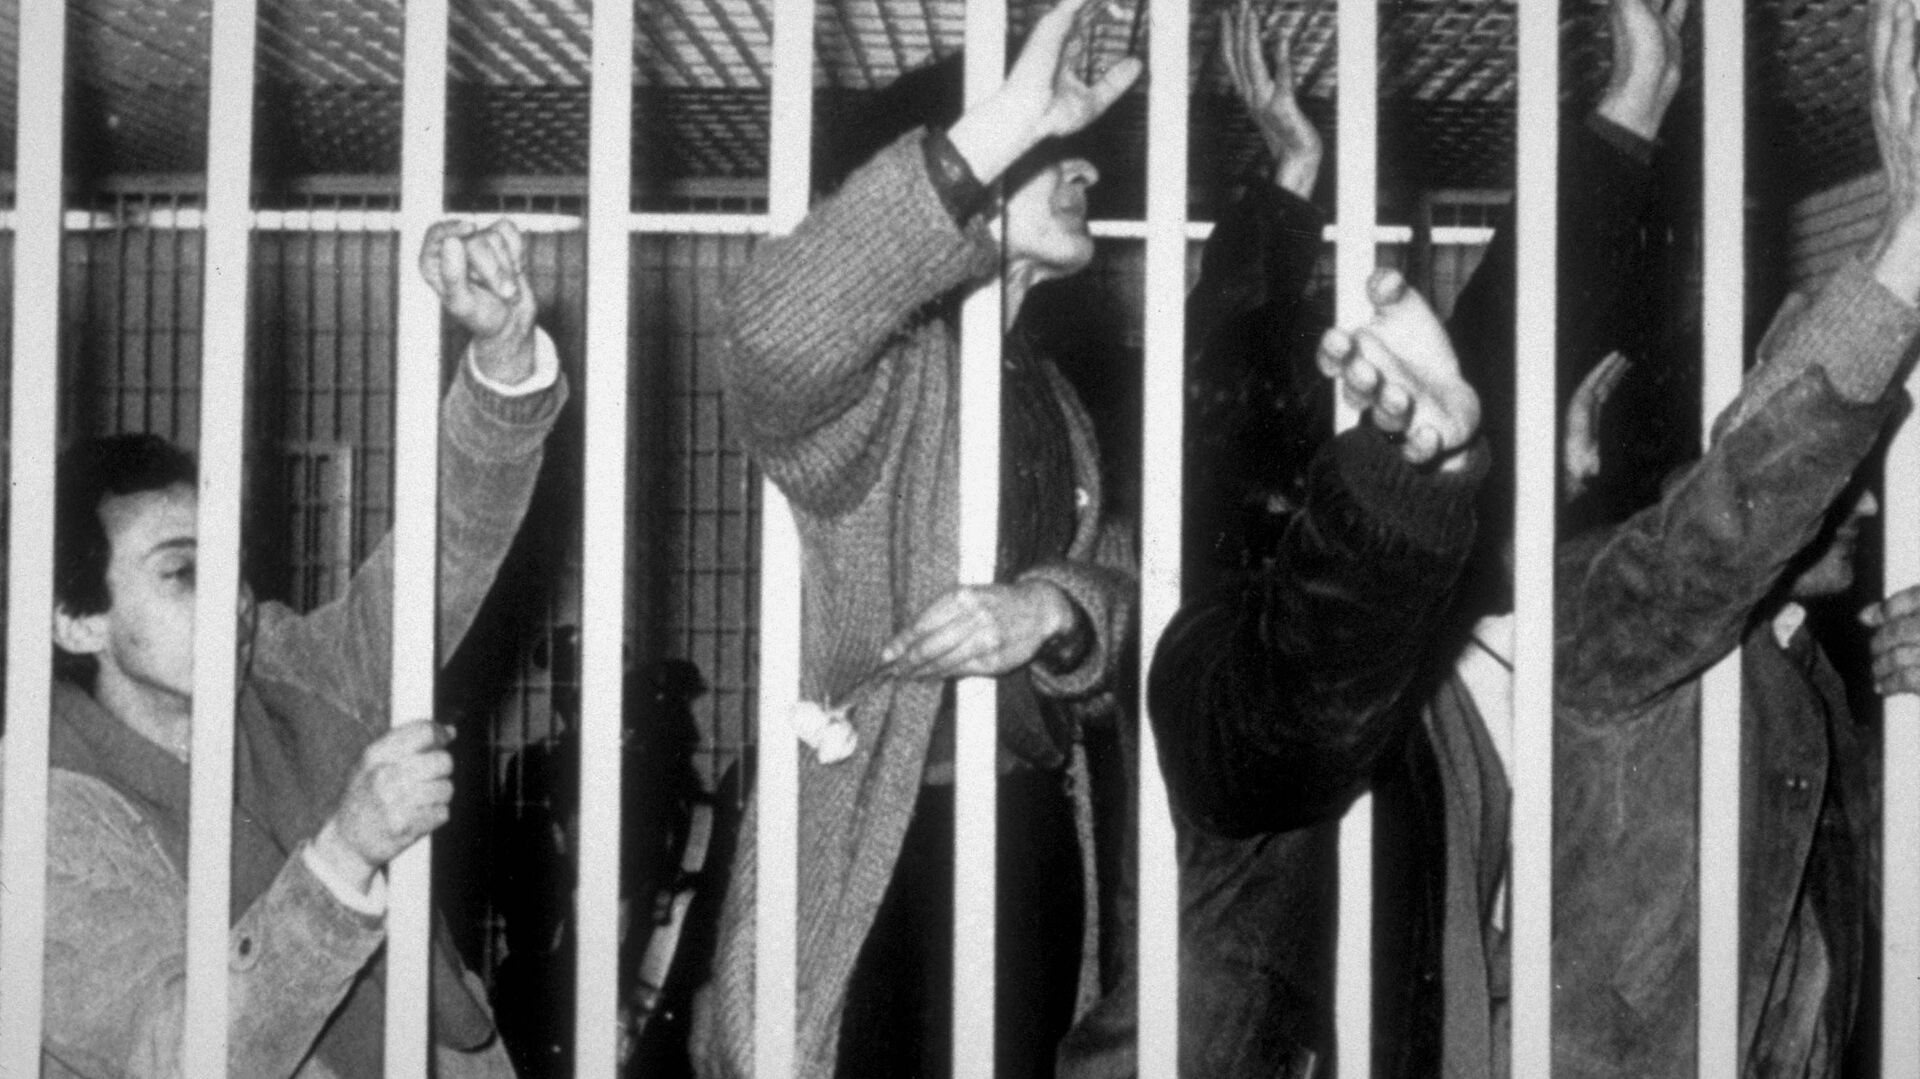 I membri delle Brigate Rosse arrestati  - Sputnik Italia, 1920, 29.04.2021